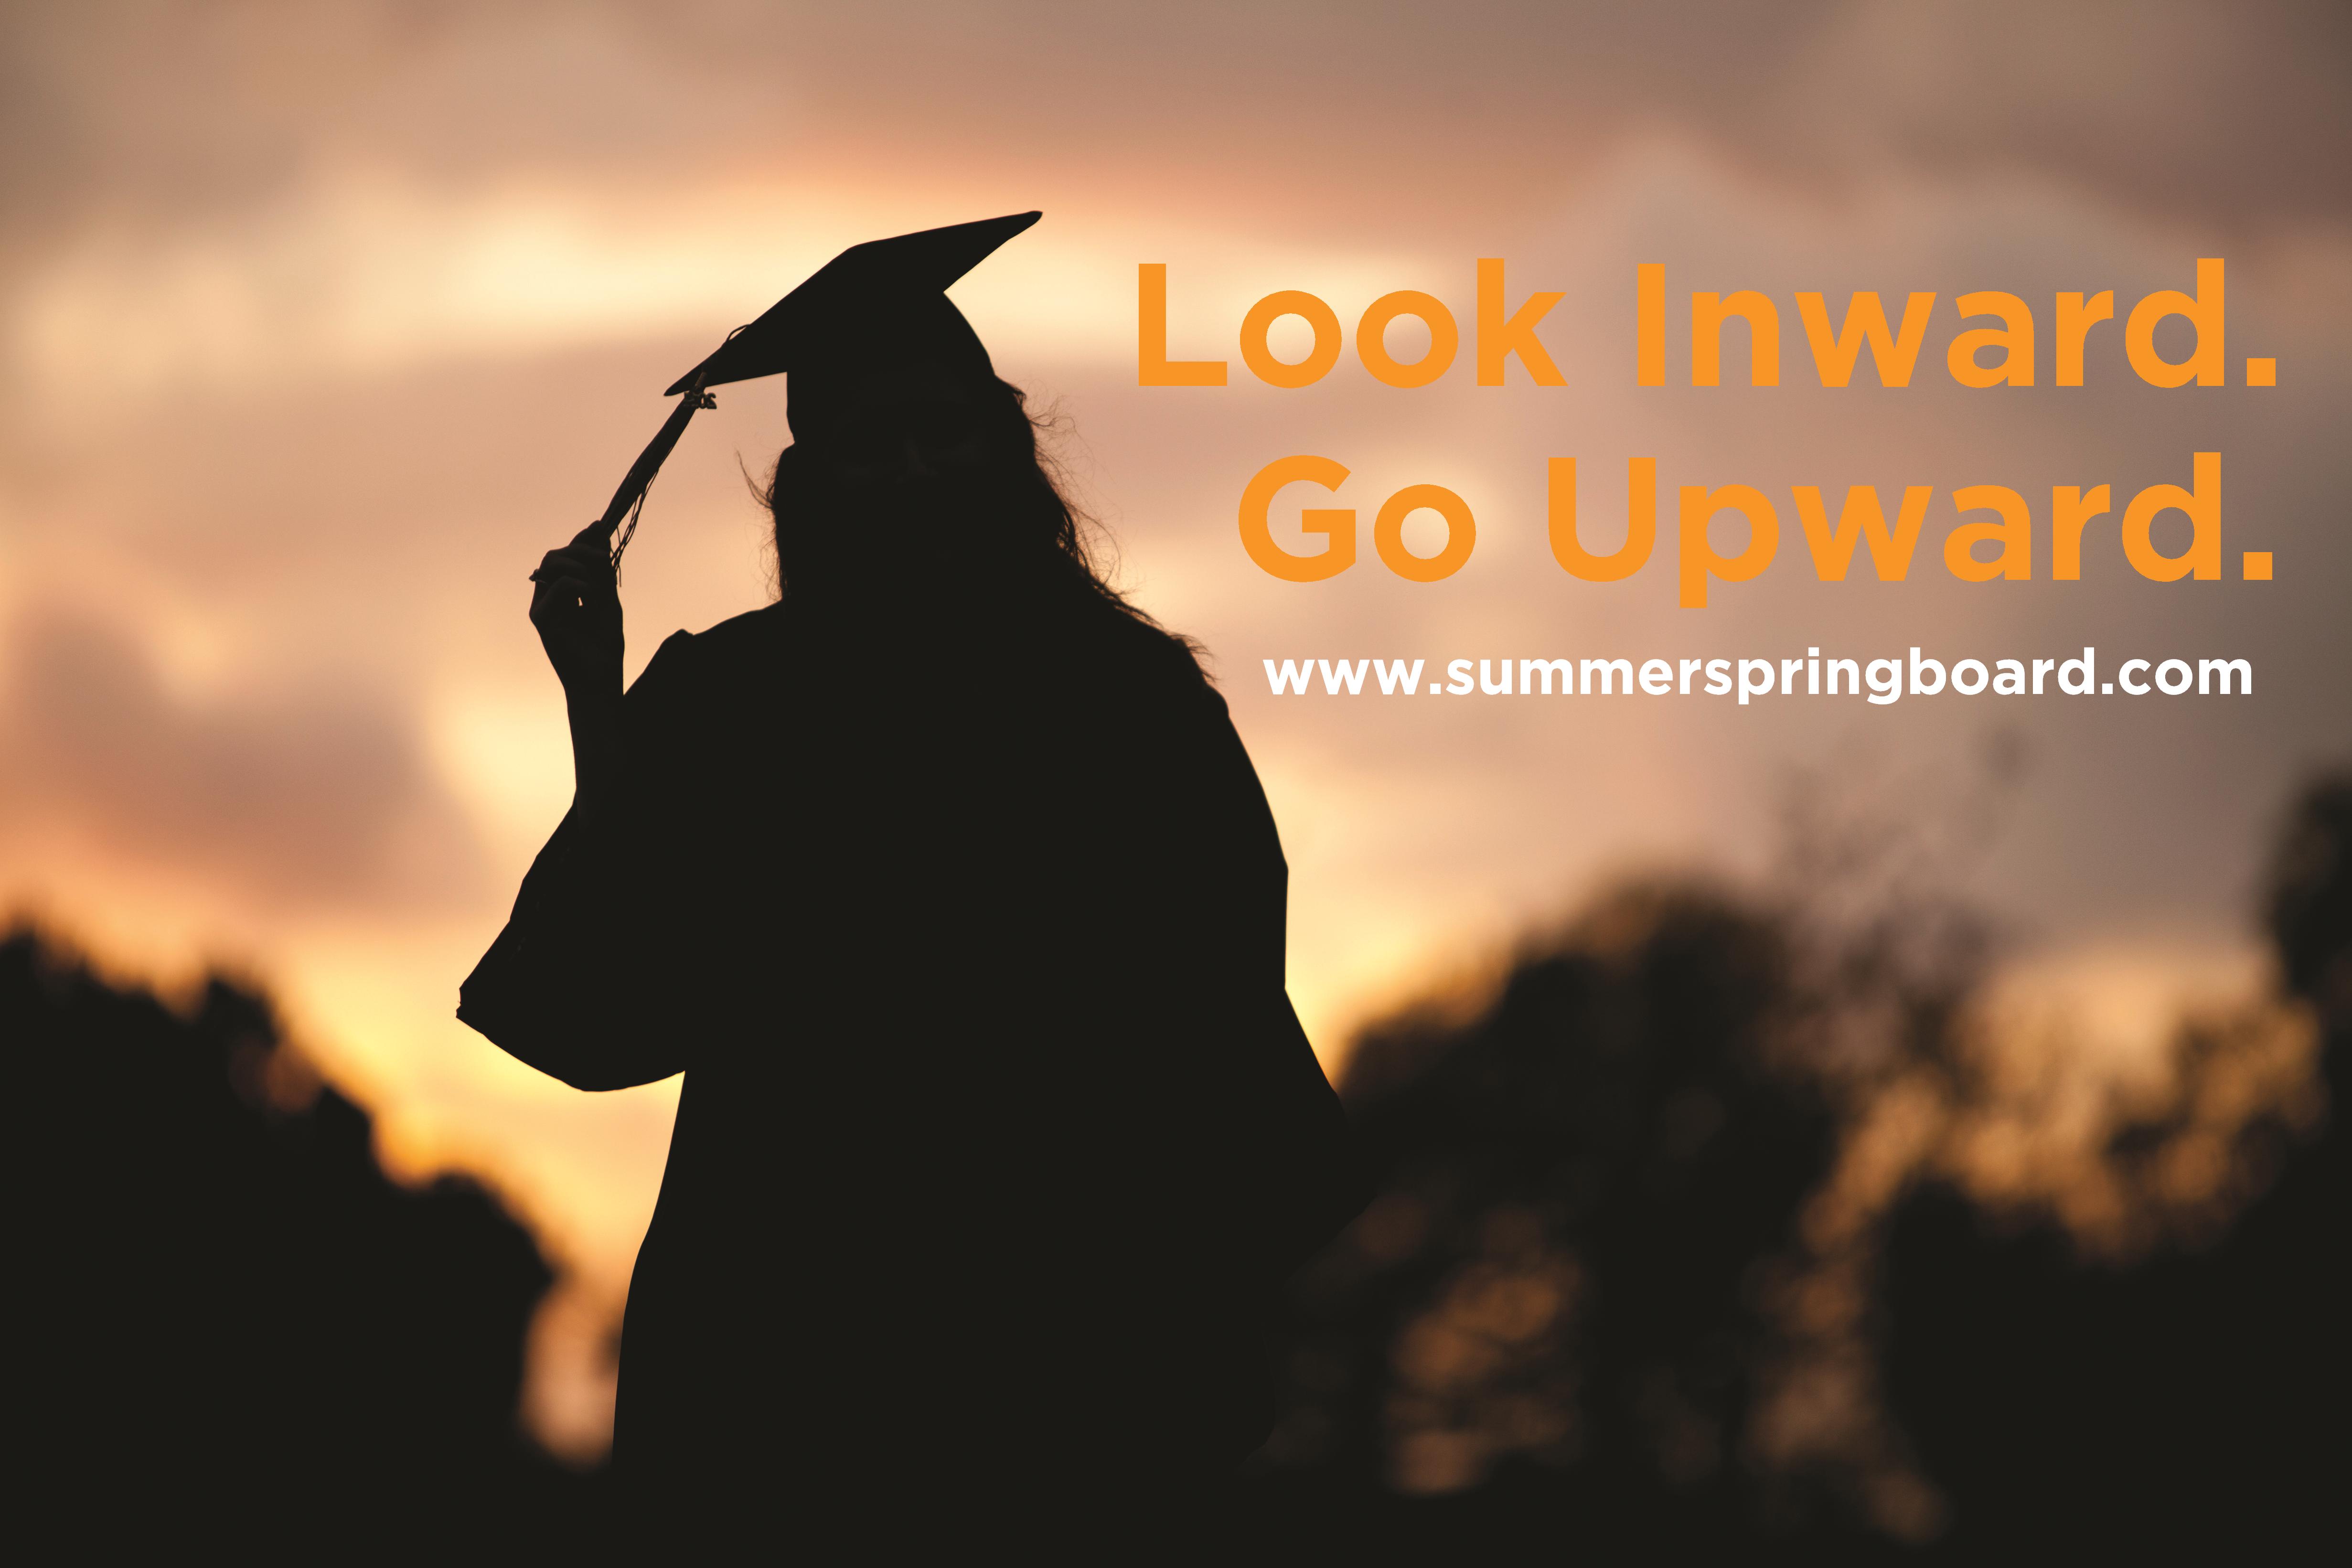 Summer Program - College Application | Summer Springboard